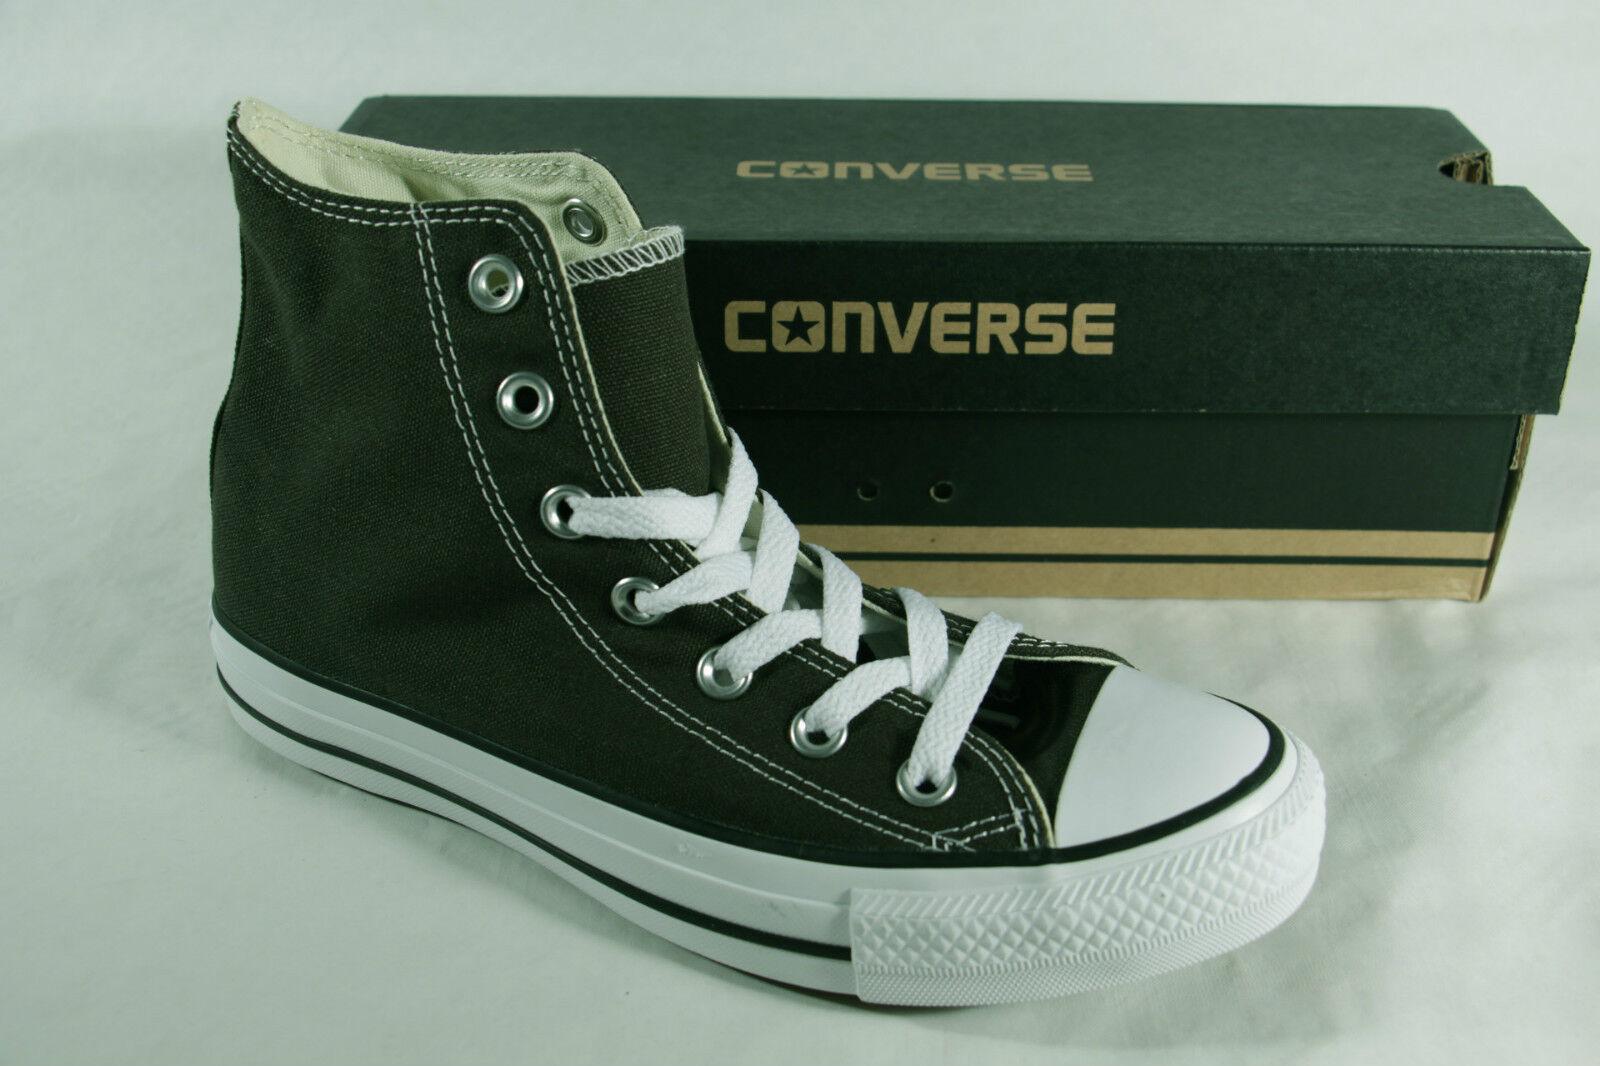 Converse ata All Star bota botas ata Converse verde oliva, textil/Leinen, nuevo b05539